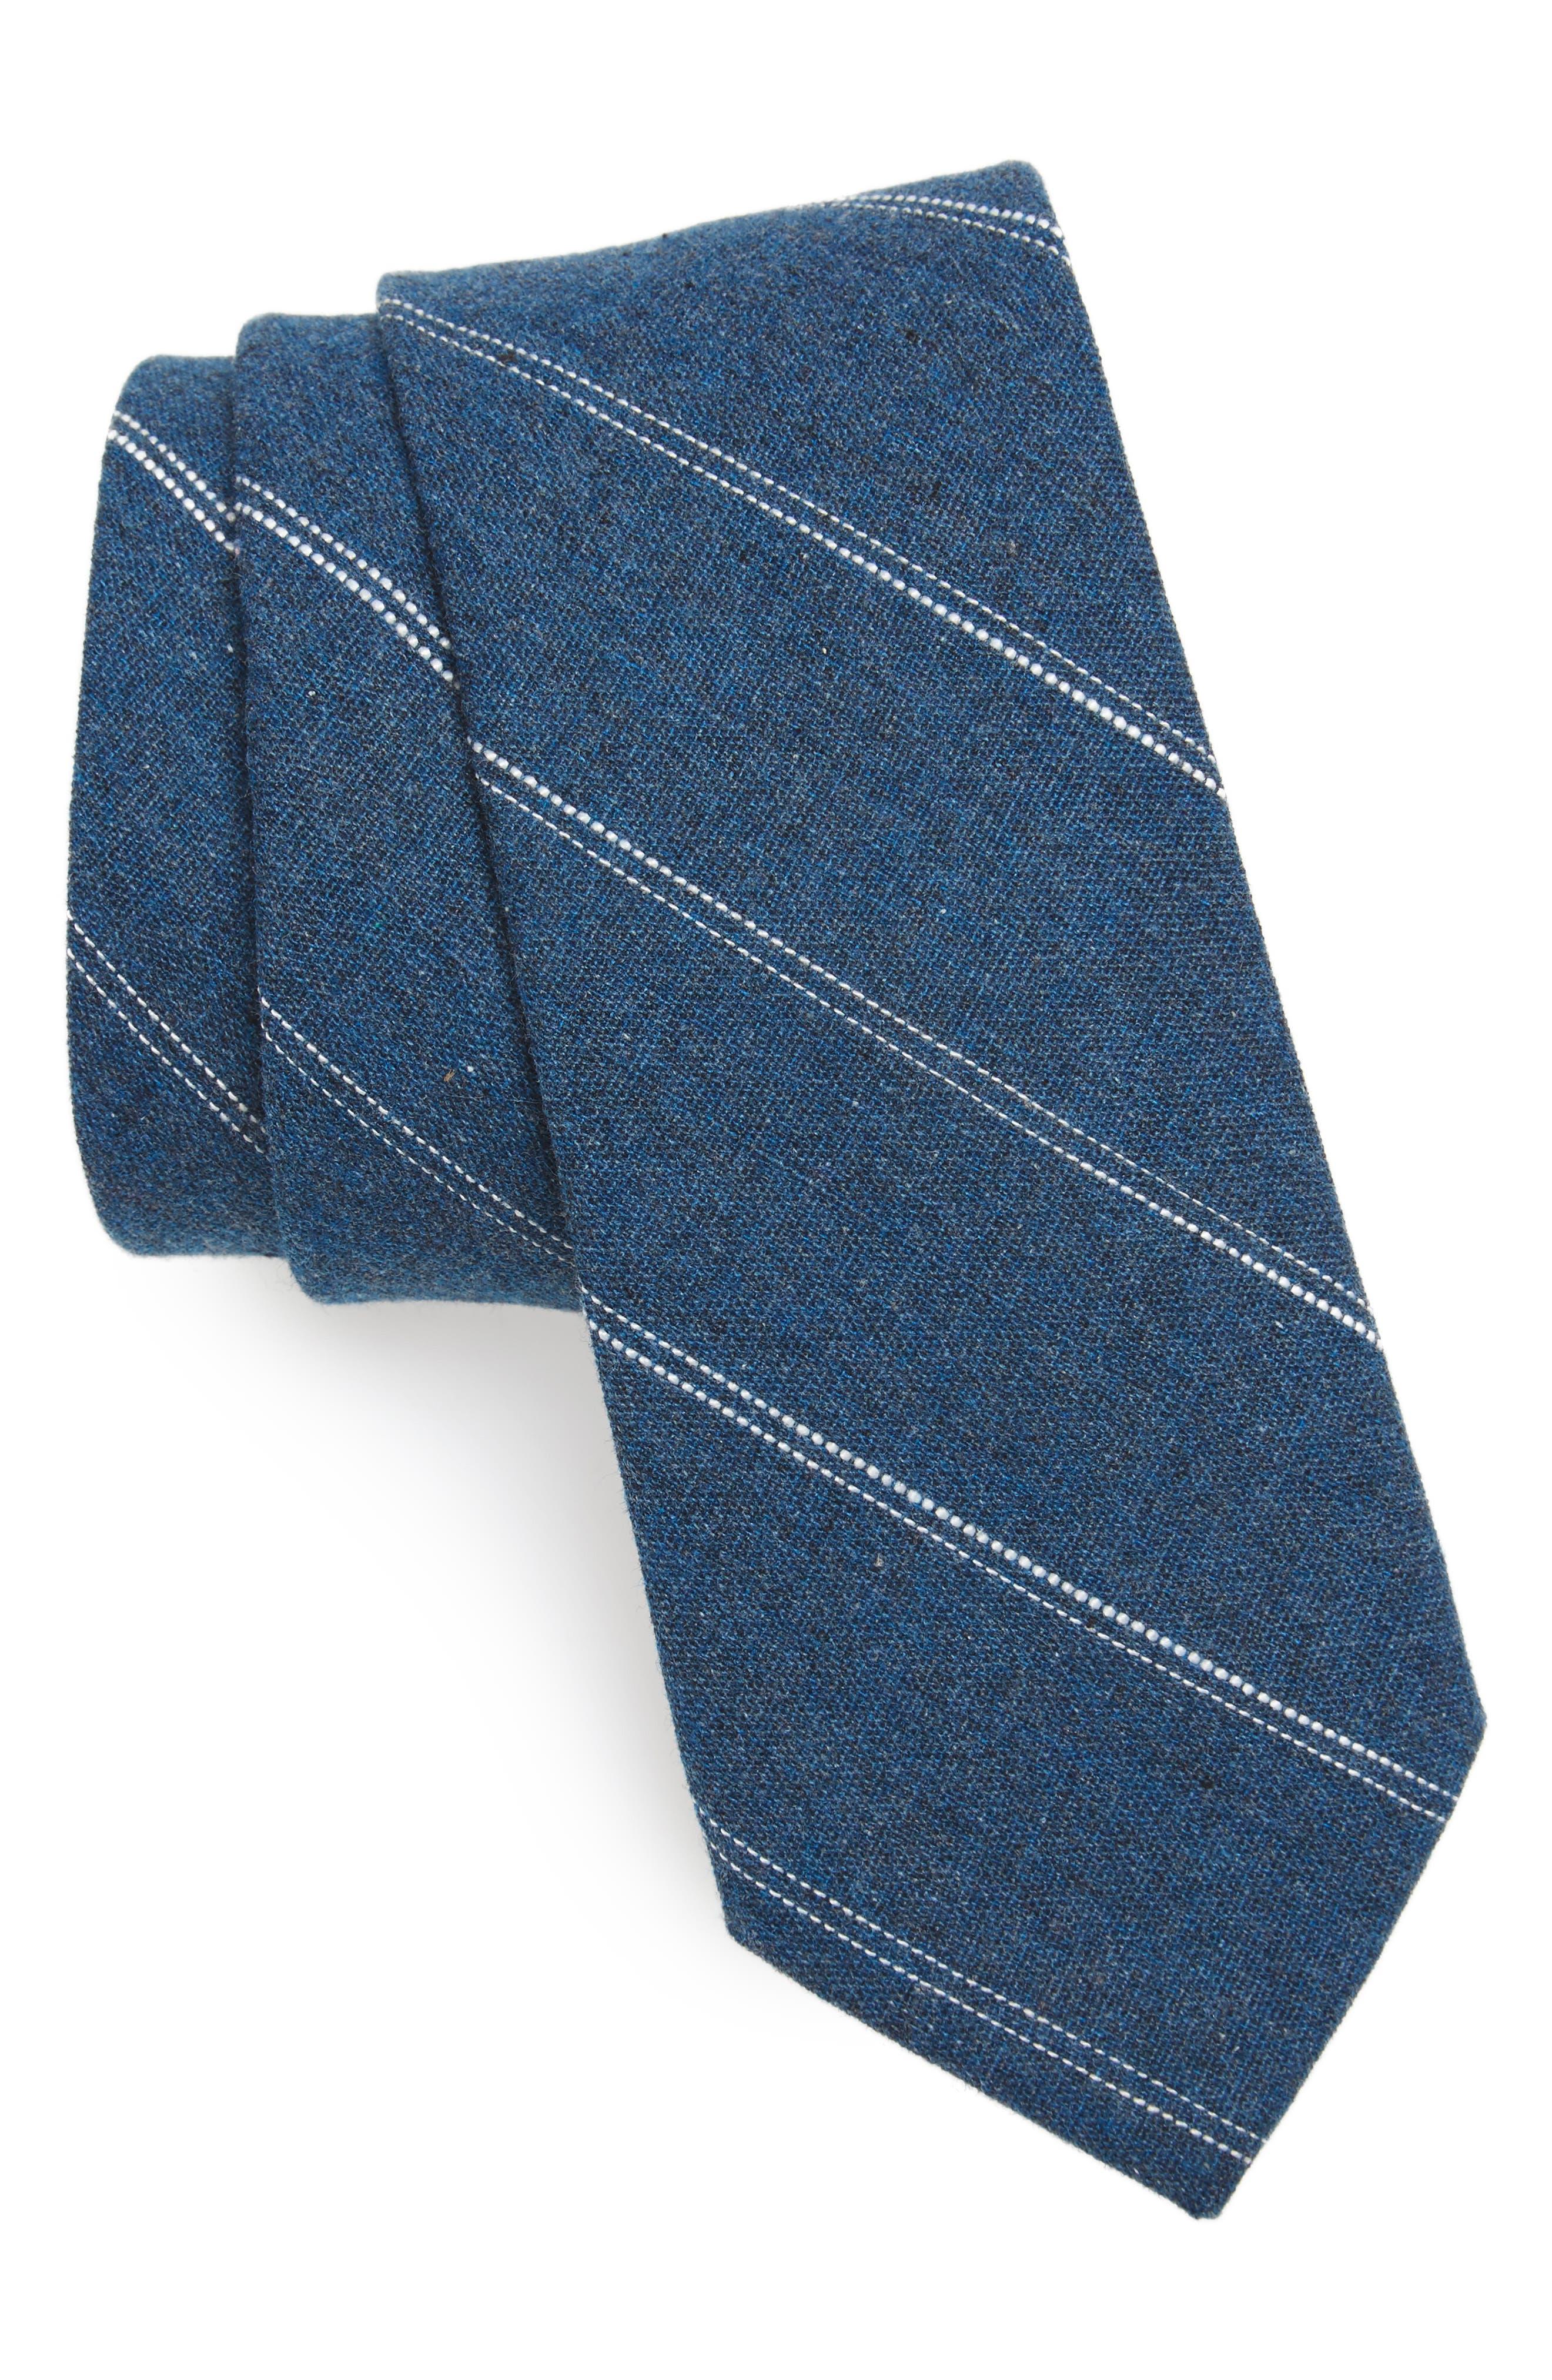 Palamino Stripe Cotton & Linen Skinny Tie,                         Main,                         color, Teal